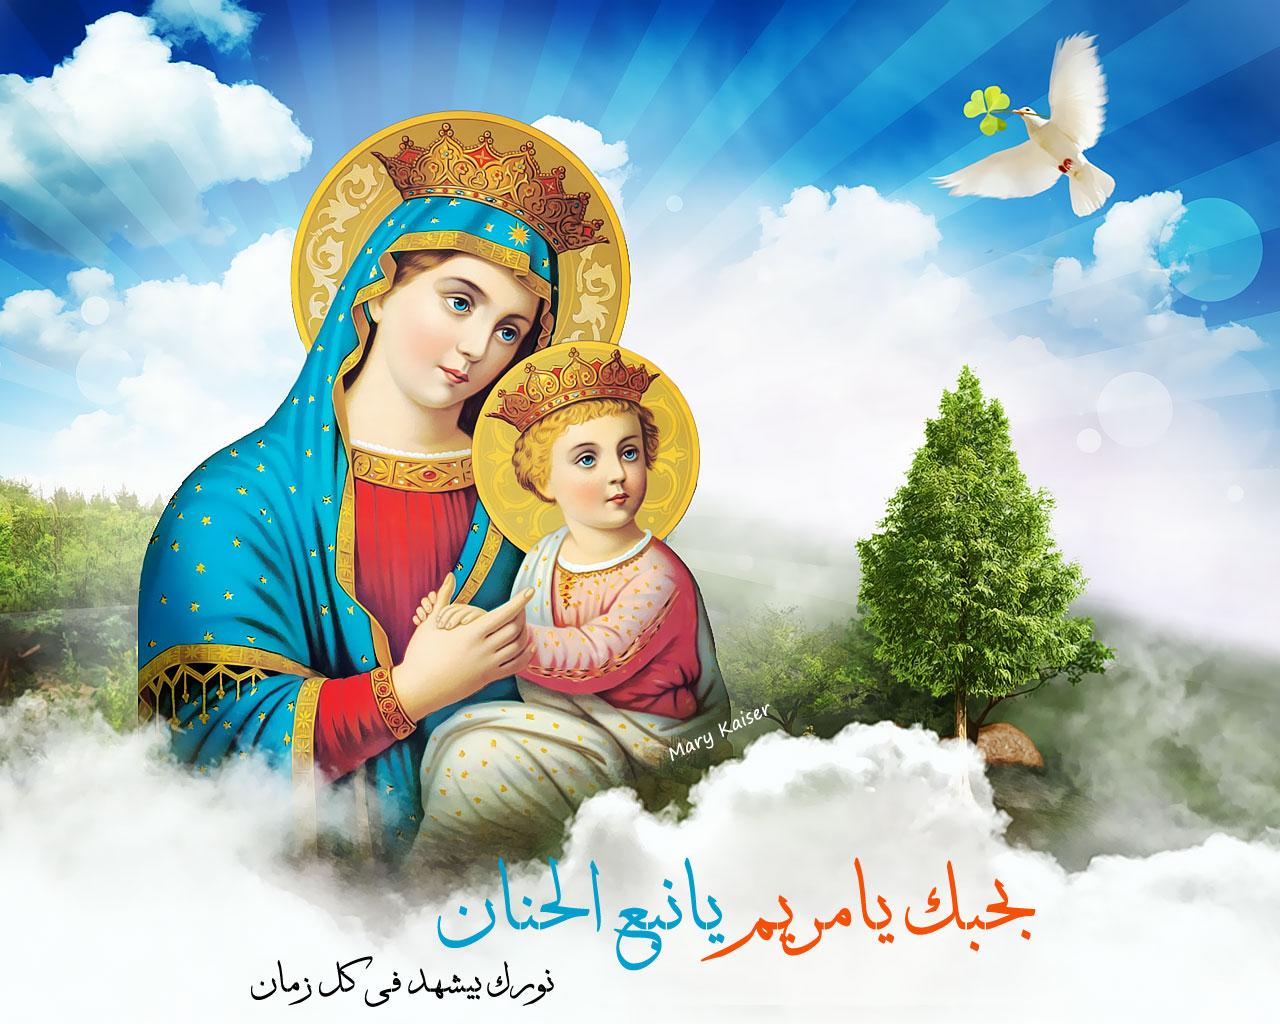 http://uncatolico.com/wp-content/gallery/imagenes-catolicas/021_uncatolicoimgcat.jpg